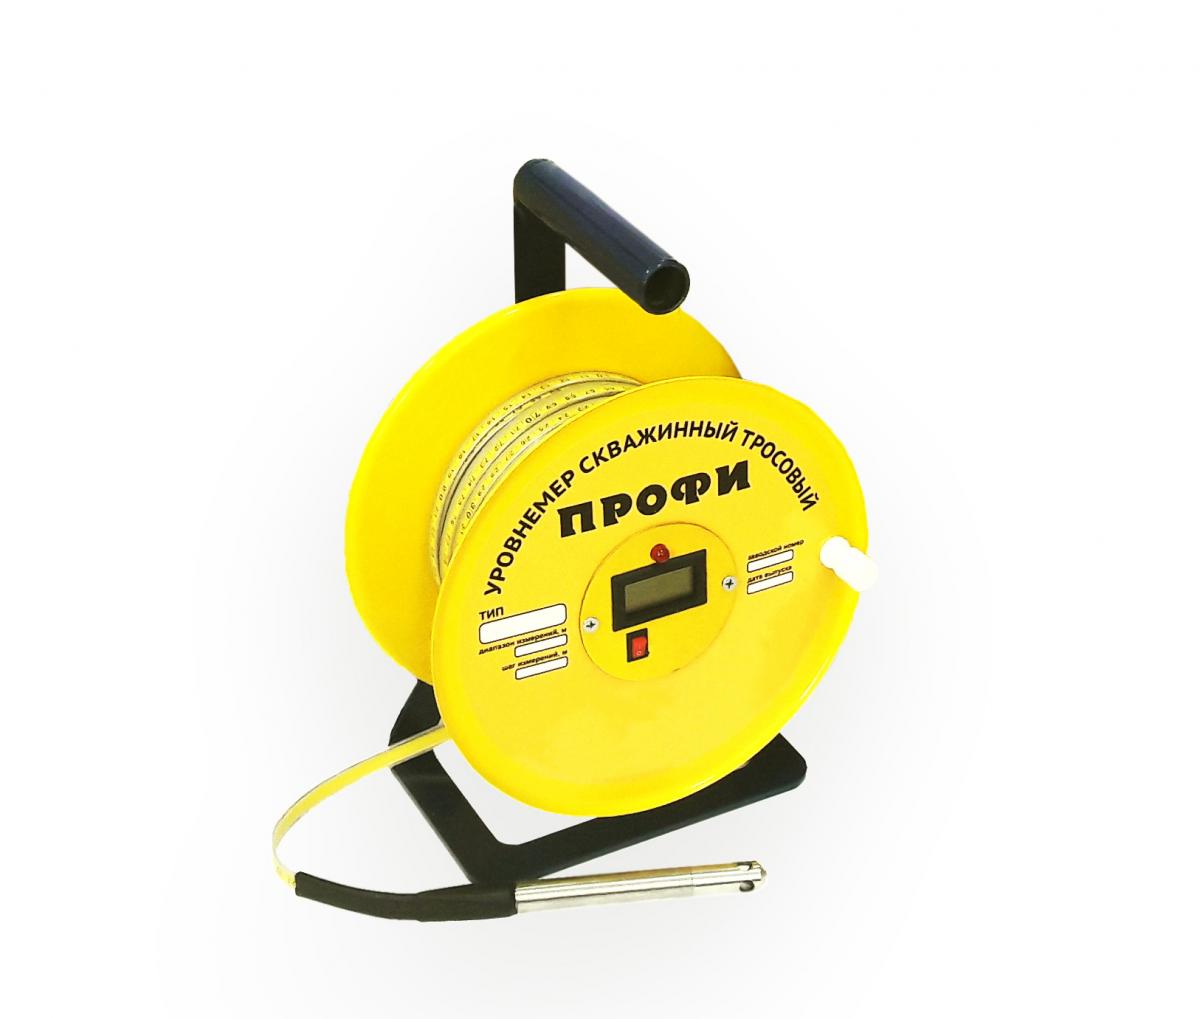 Уровнемер с термометром УТСК-ТЭ ПРОФИ-200